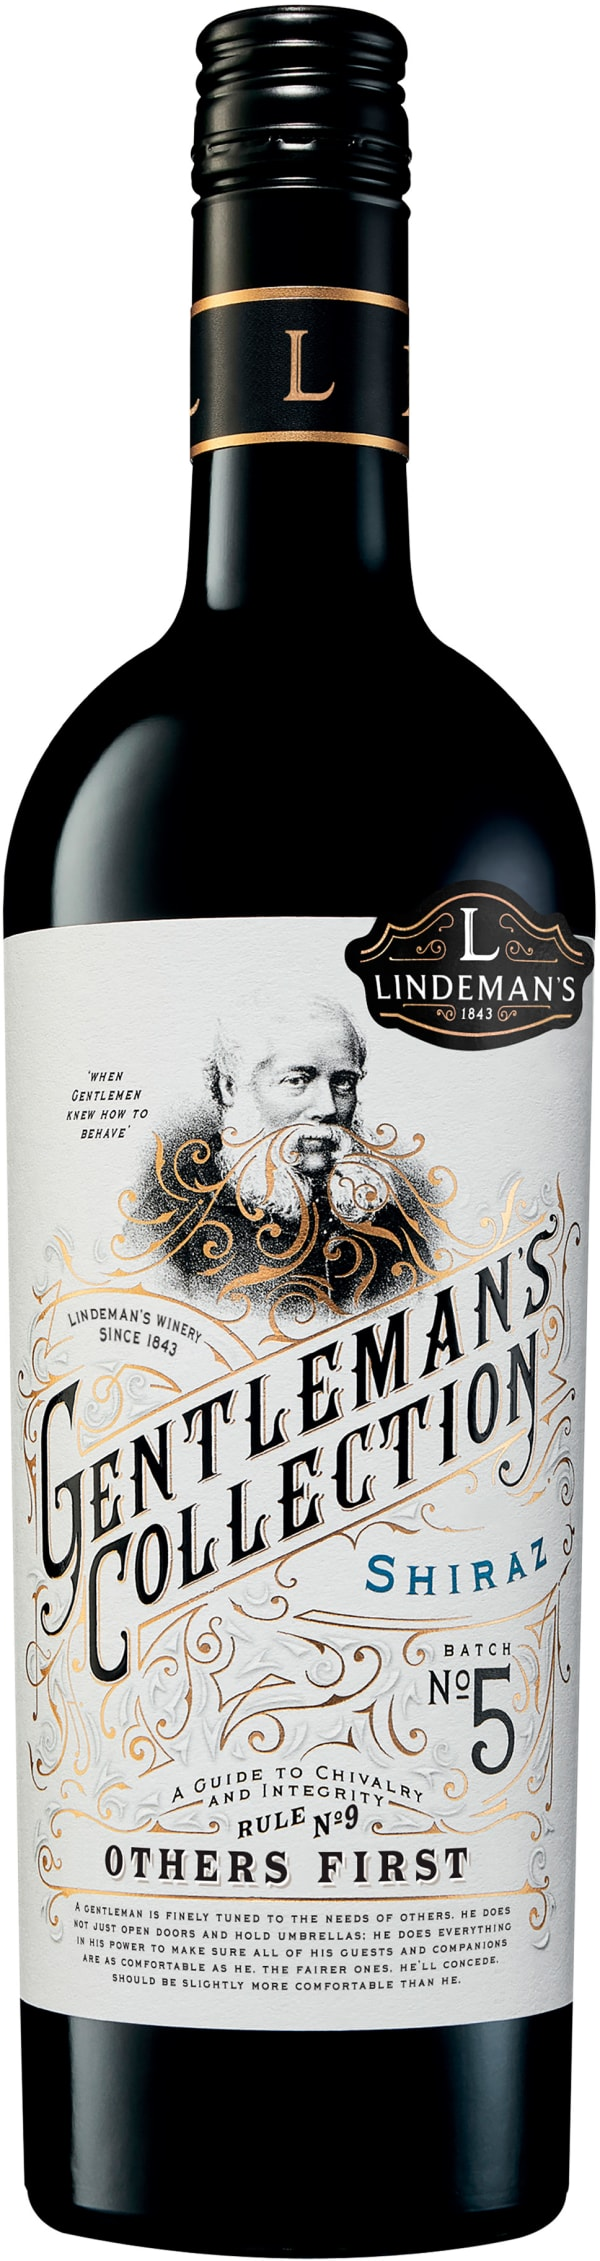 Lindeman's Gentlemans Collection Shiraz 2019